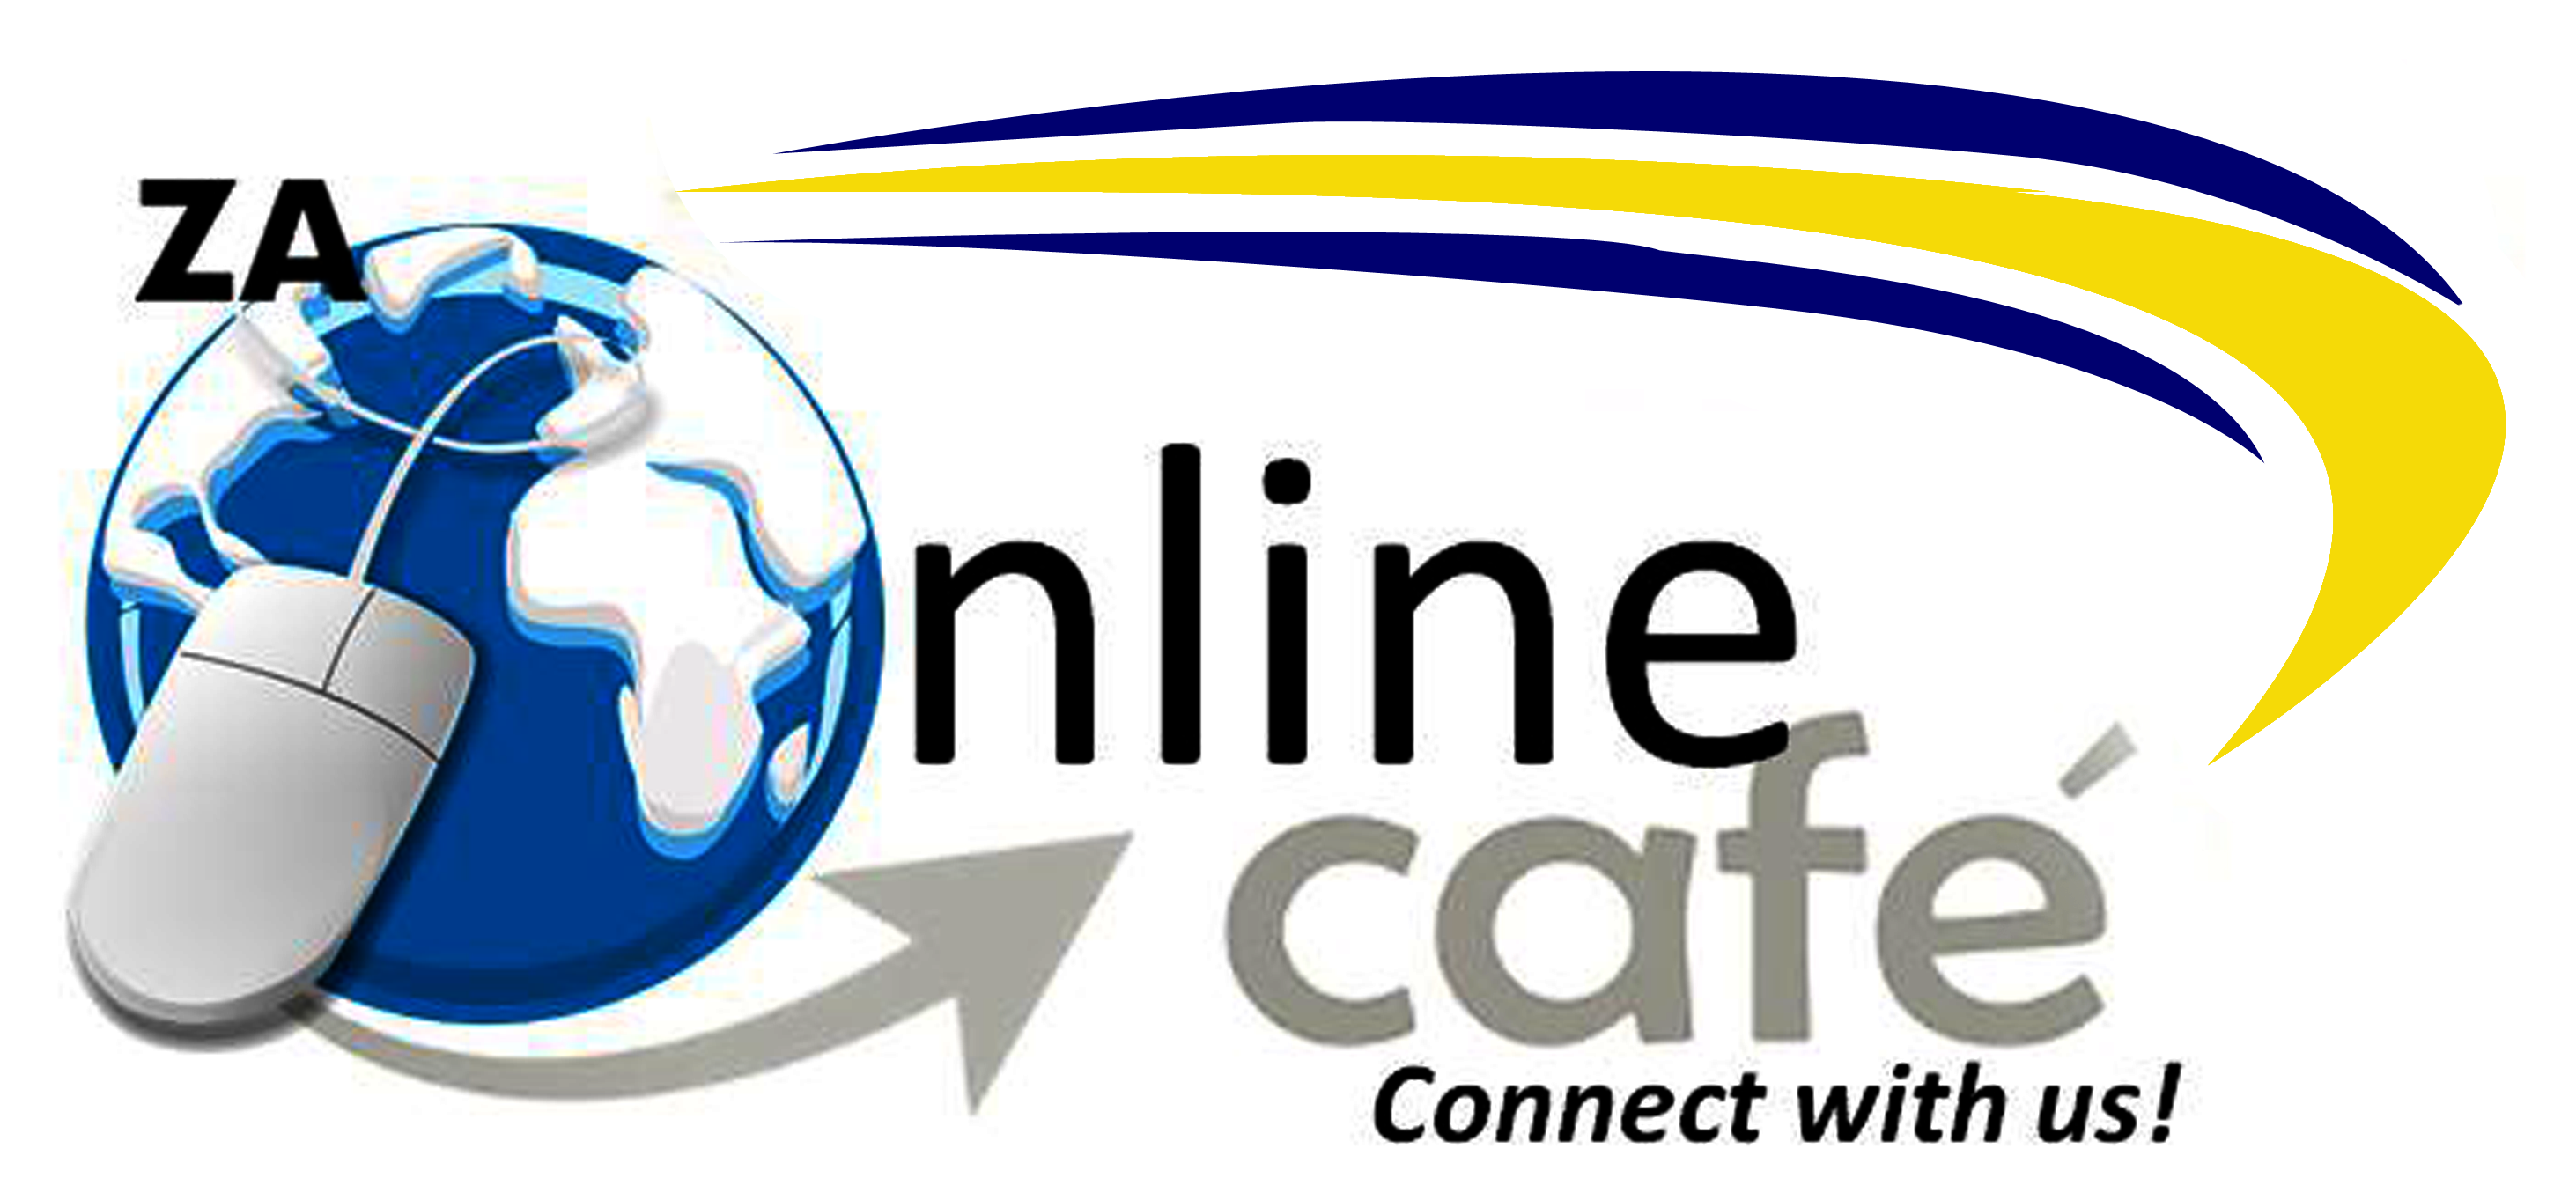 ZA Online Cafe Logo